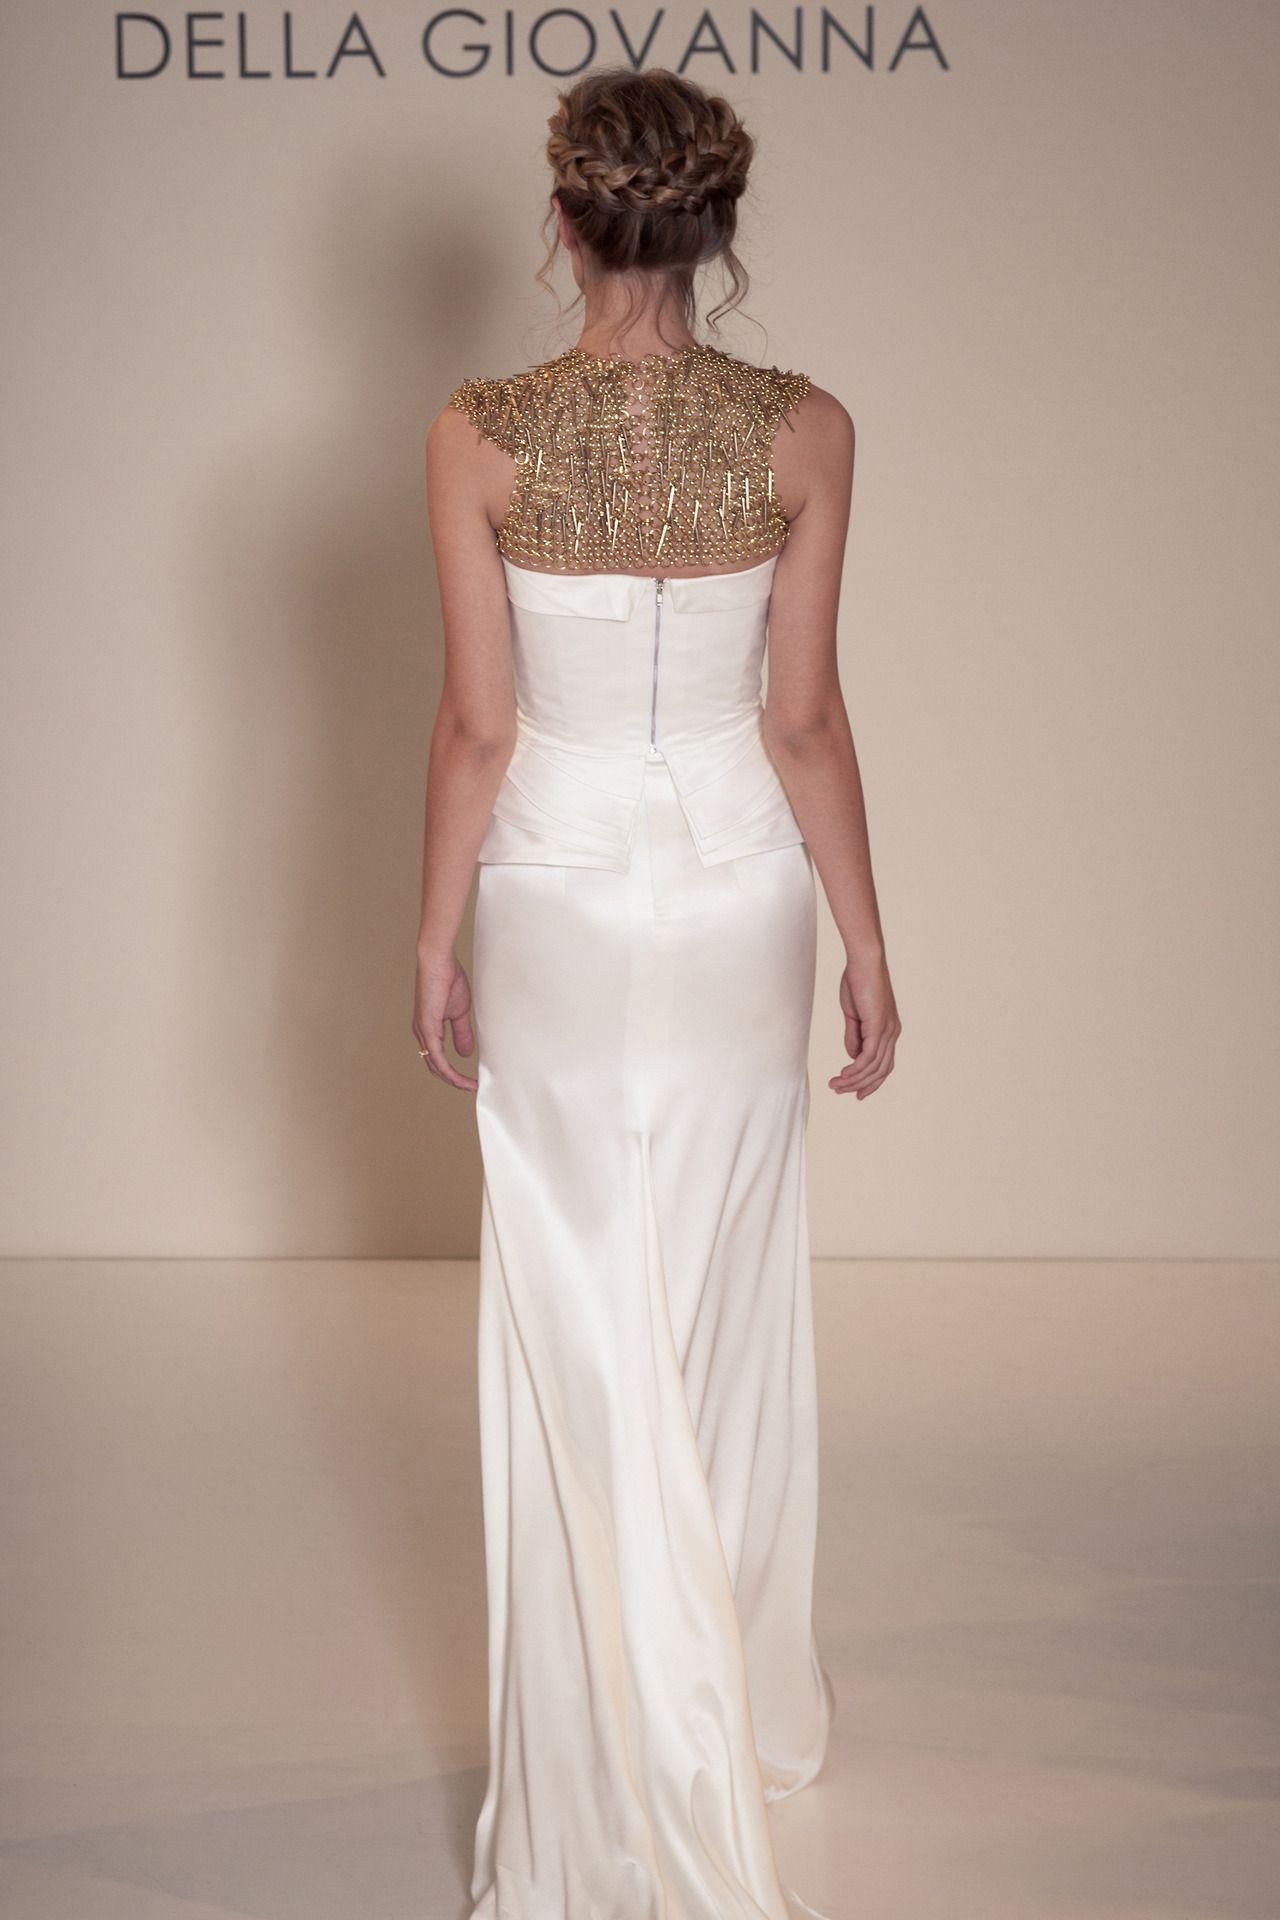 Destination Style - Designer Spotlight: Della Giovanna…Bridal Separates  McAllister Corset, Elizabeth Skirt & Brienne Neckpiece